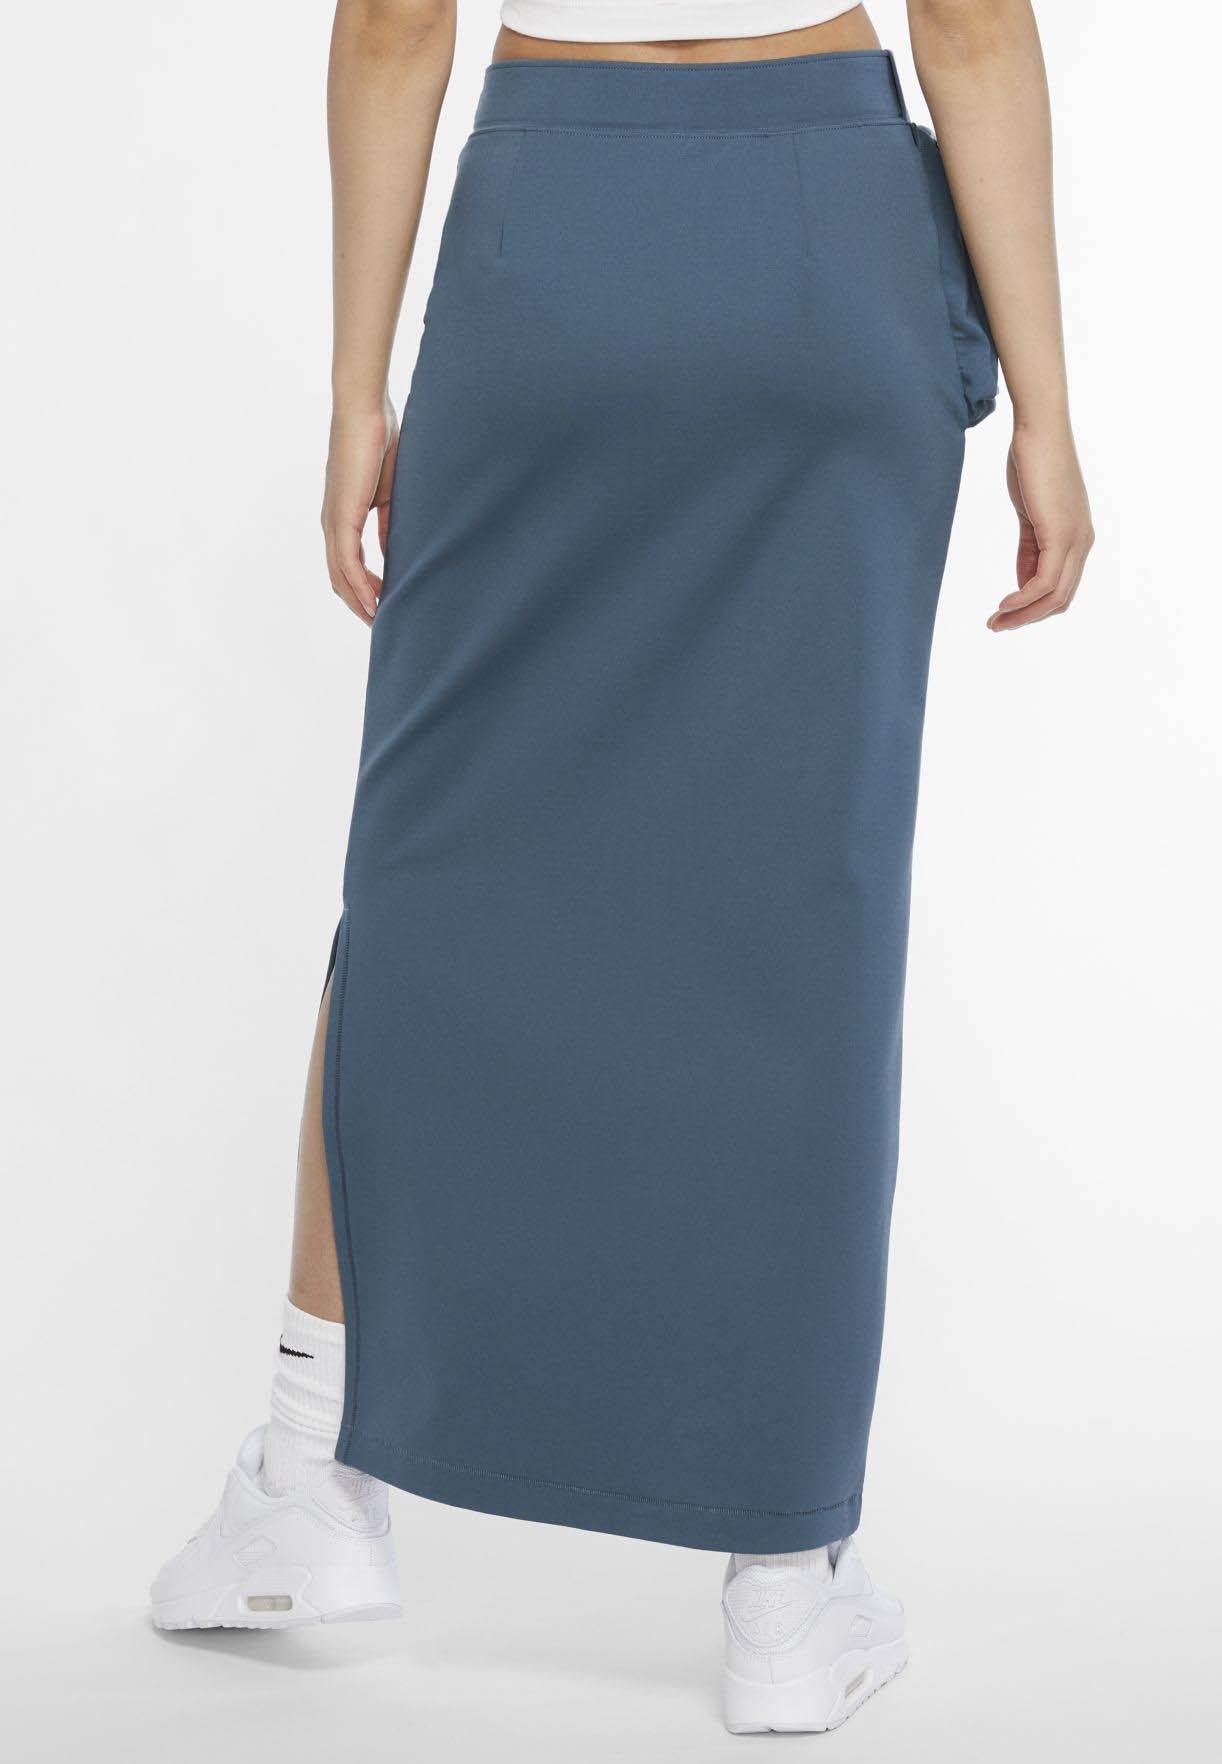 Nike Sportswear Pencil skirt - ash green t7W4H